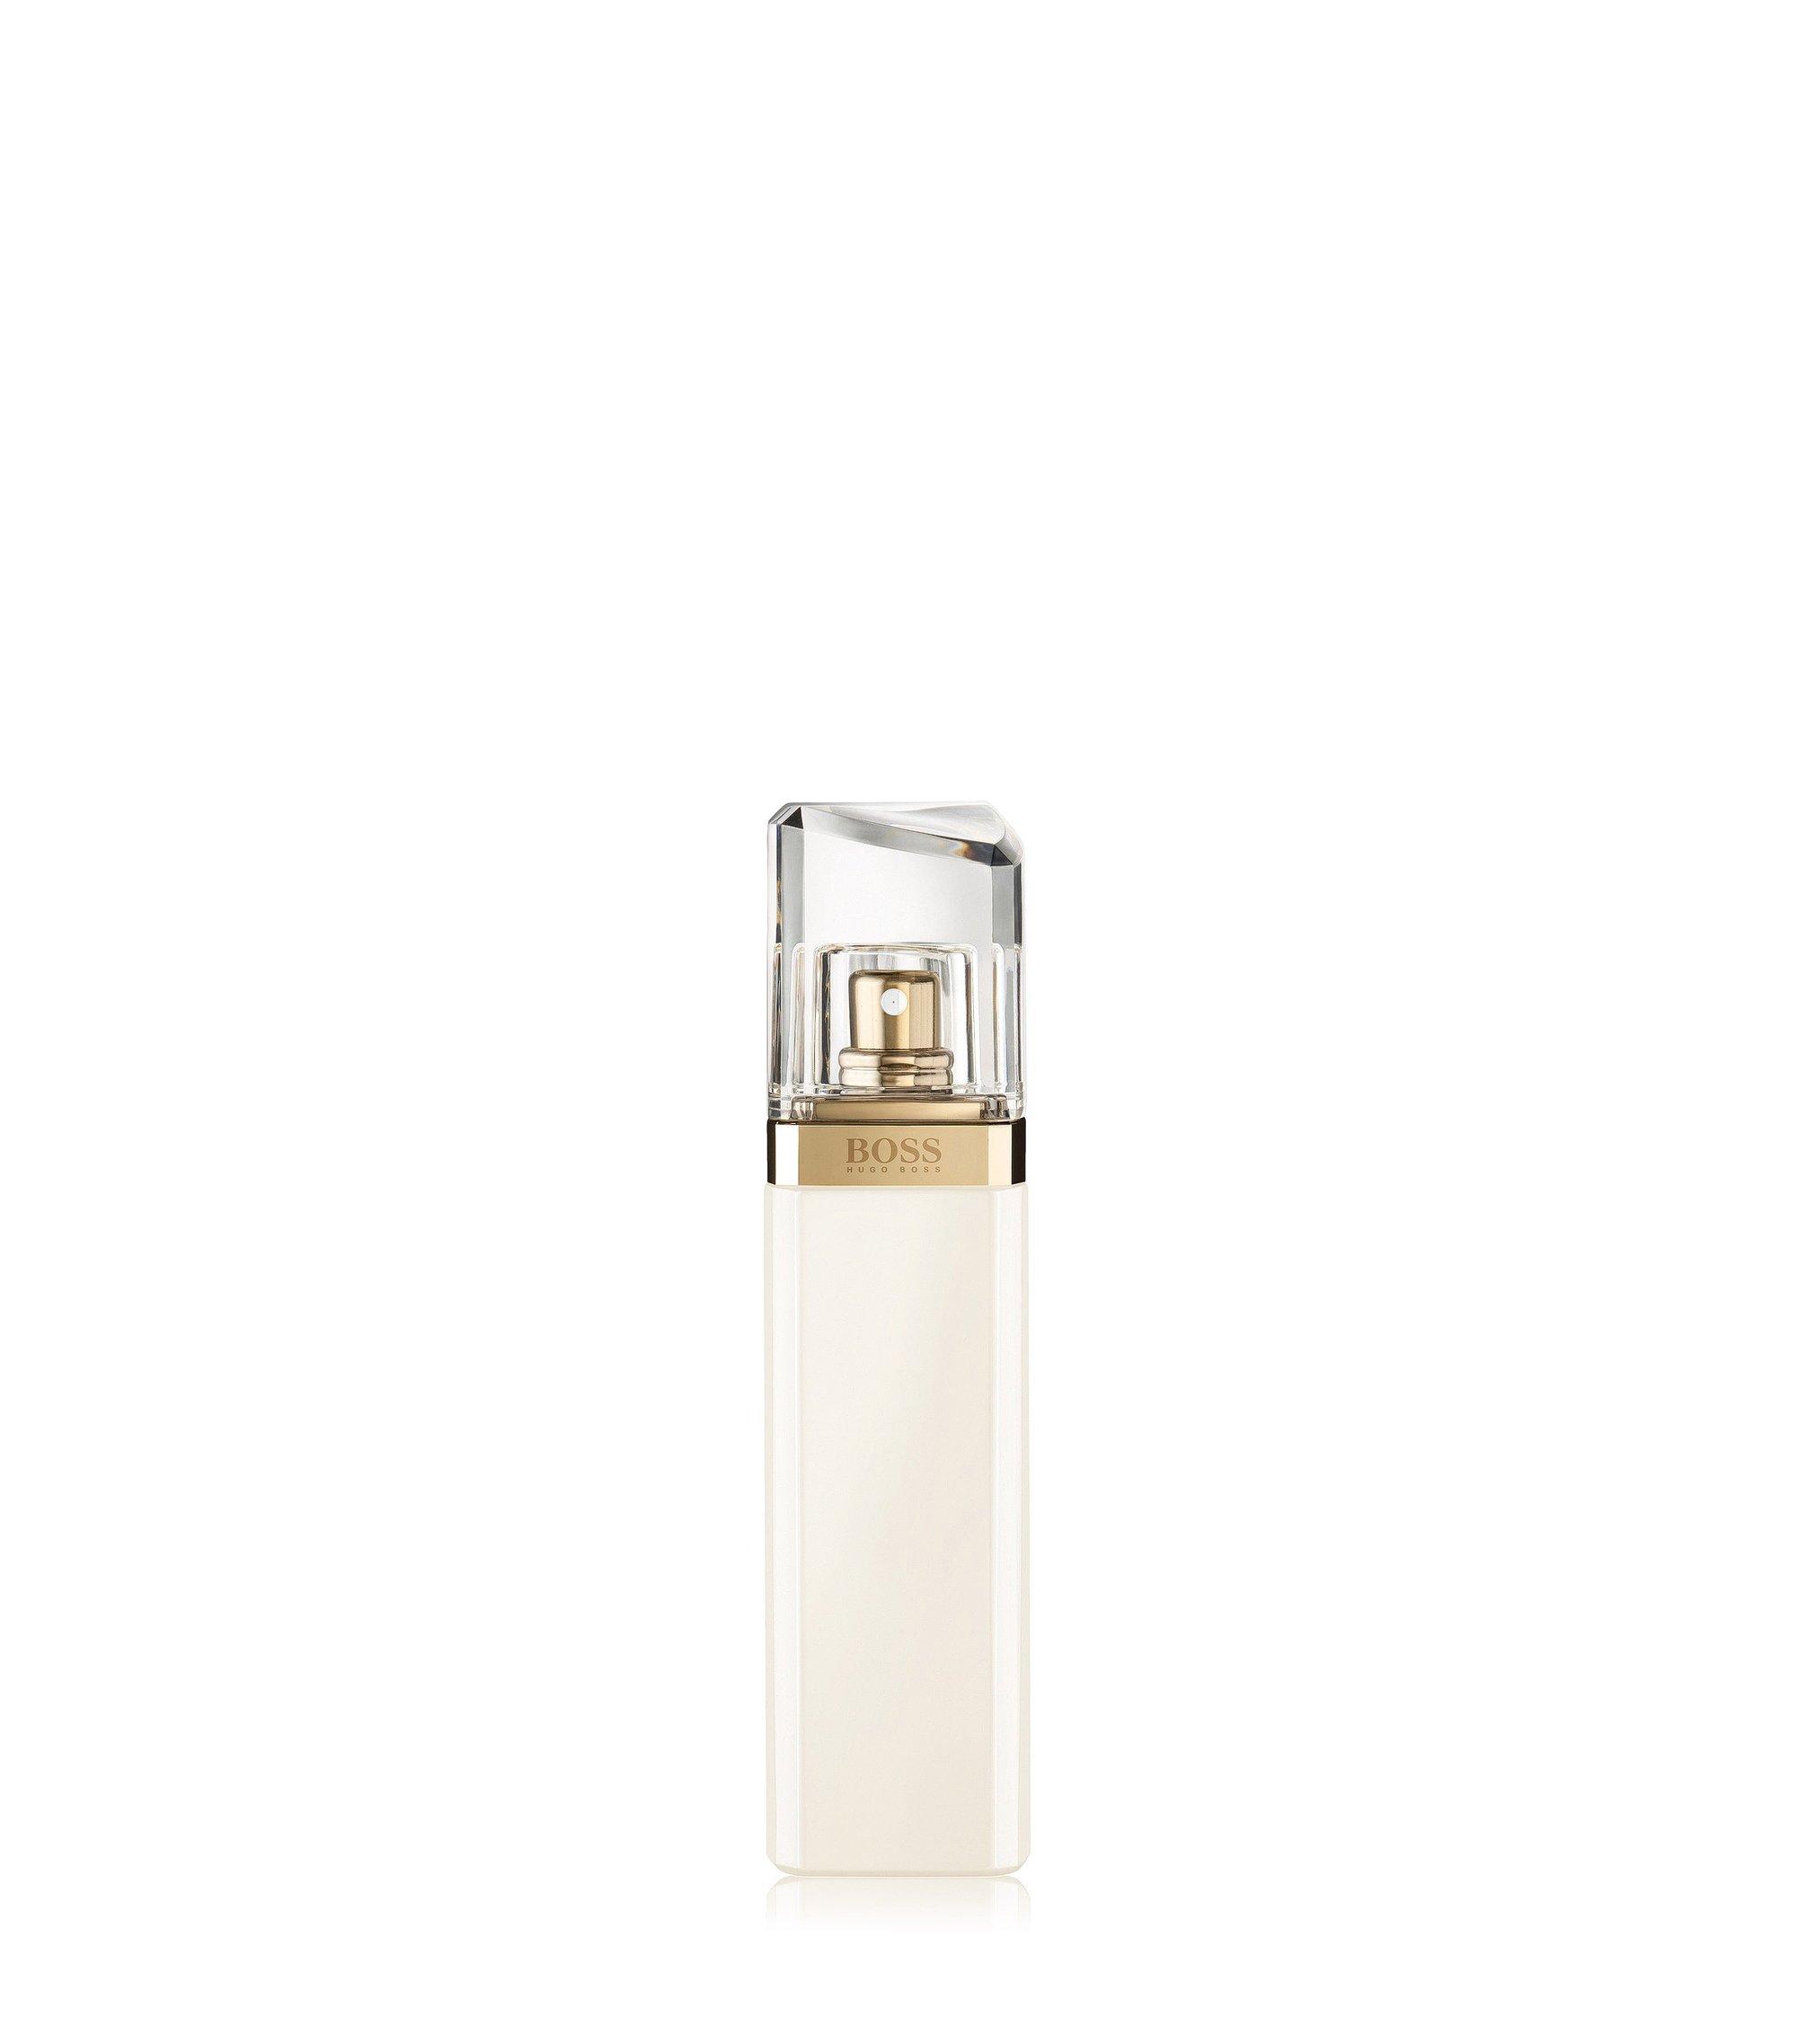 BOSS Jour eau de parfum 50ml, Assorted-Pre-Pack